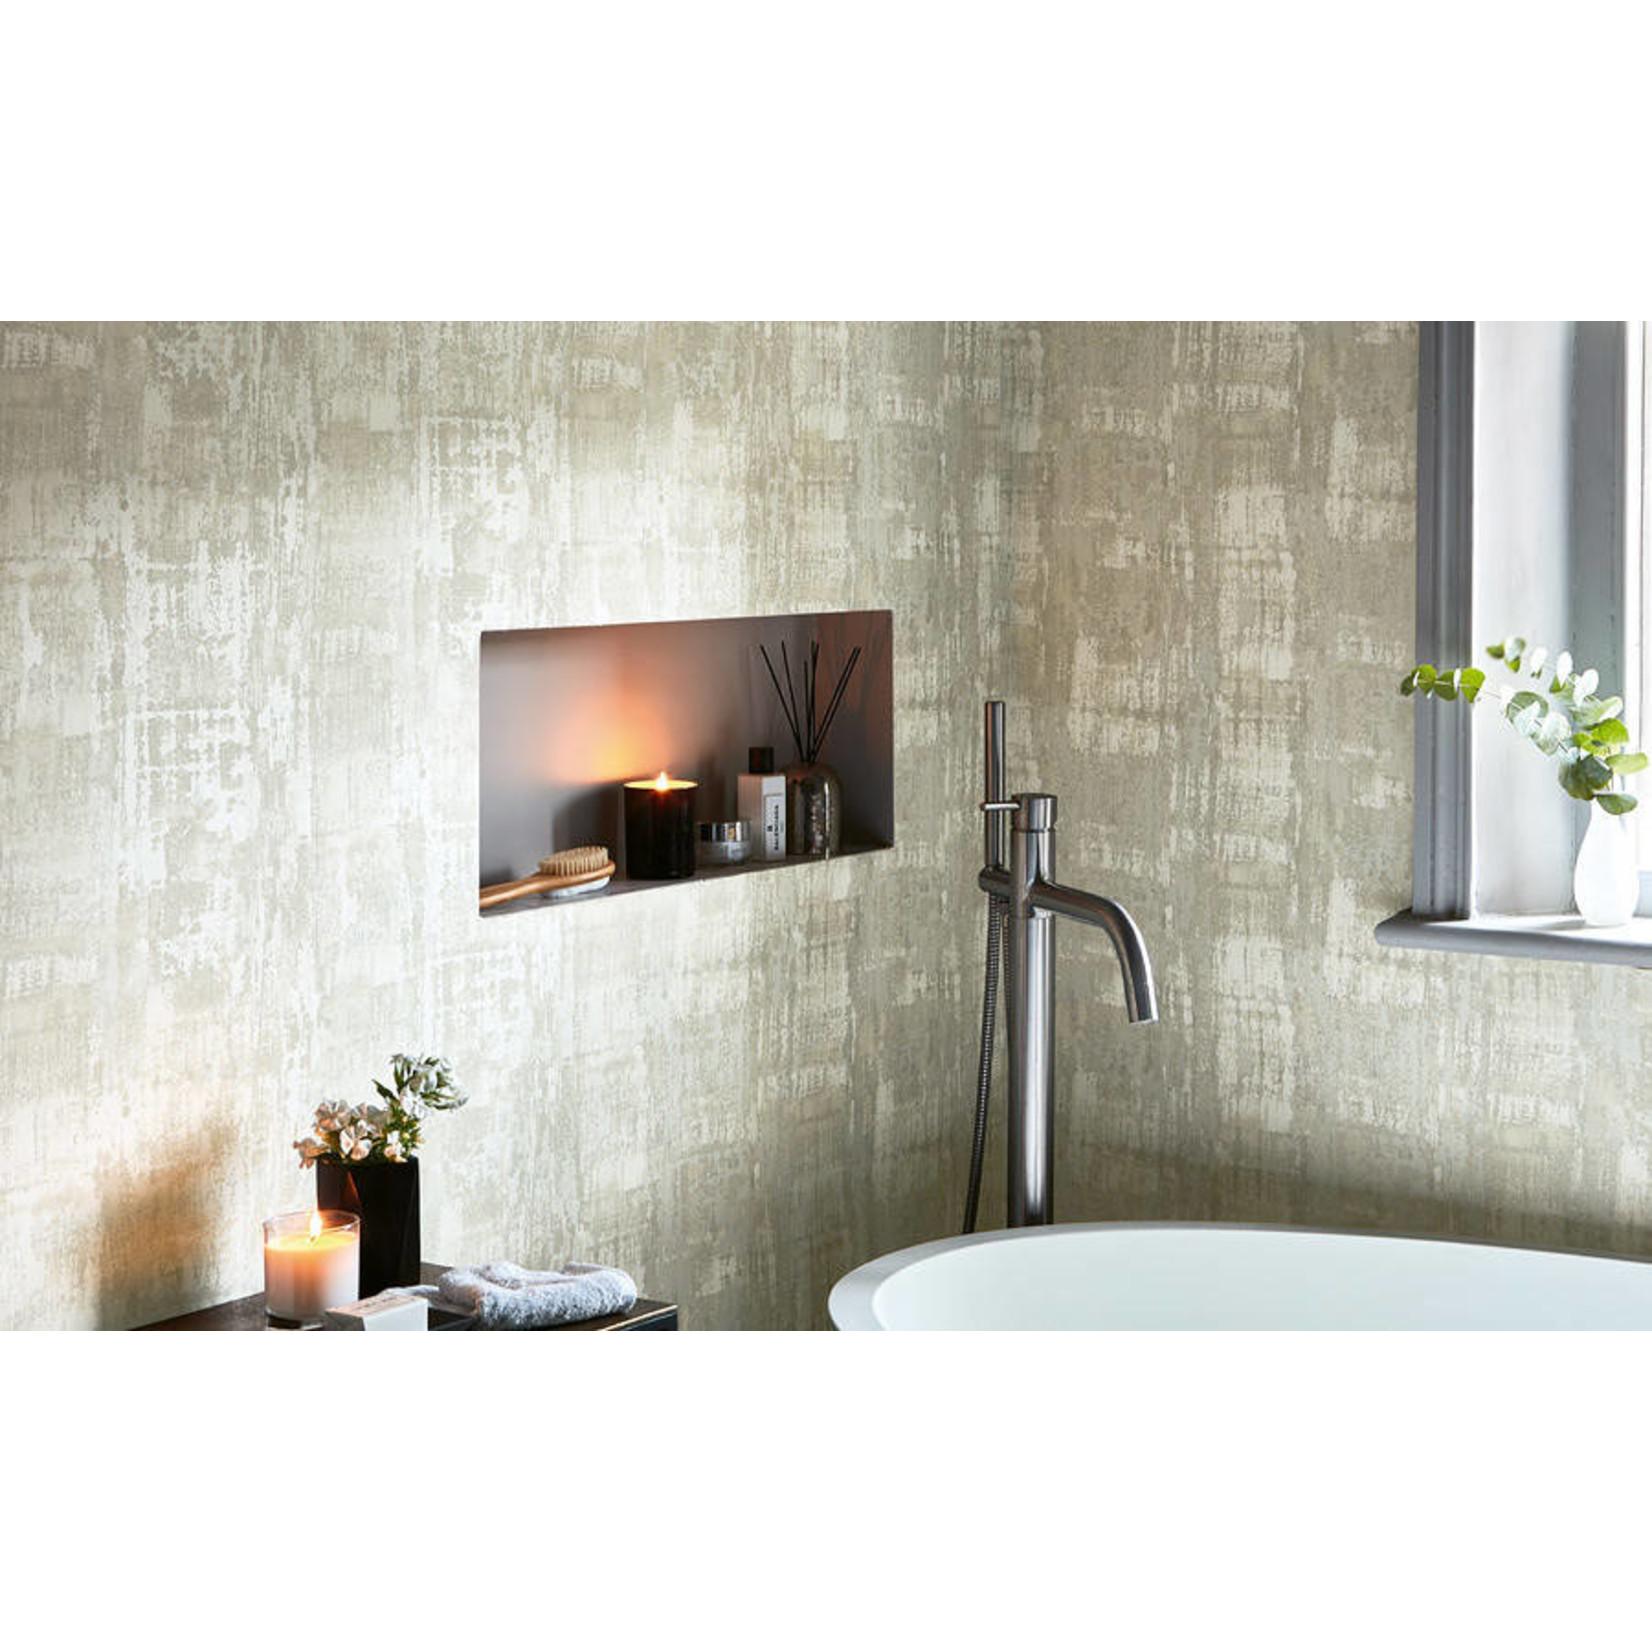 Villa Nova Renzo Wallcoverings | Anta Wallcovering Pumice